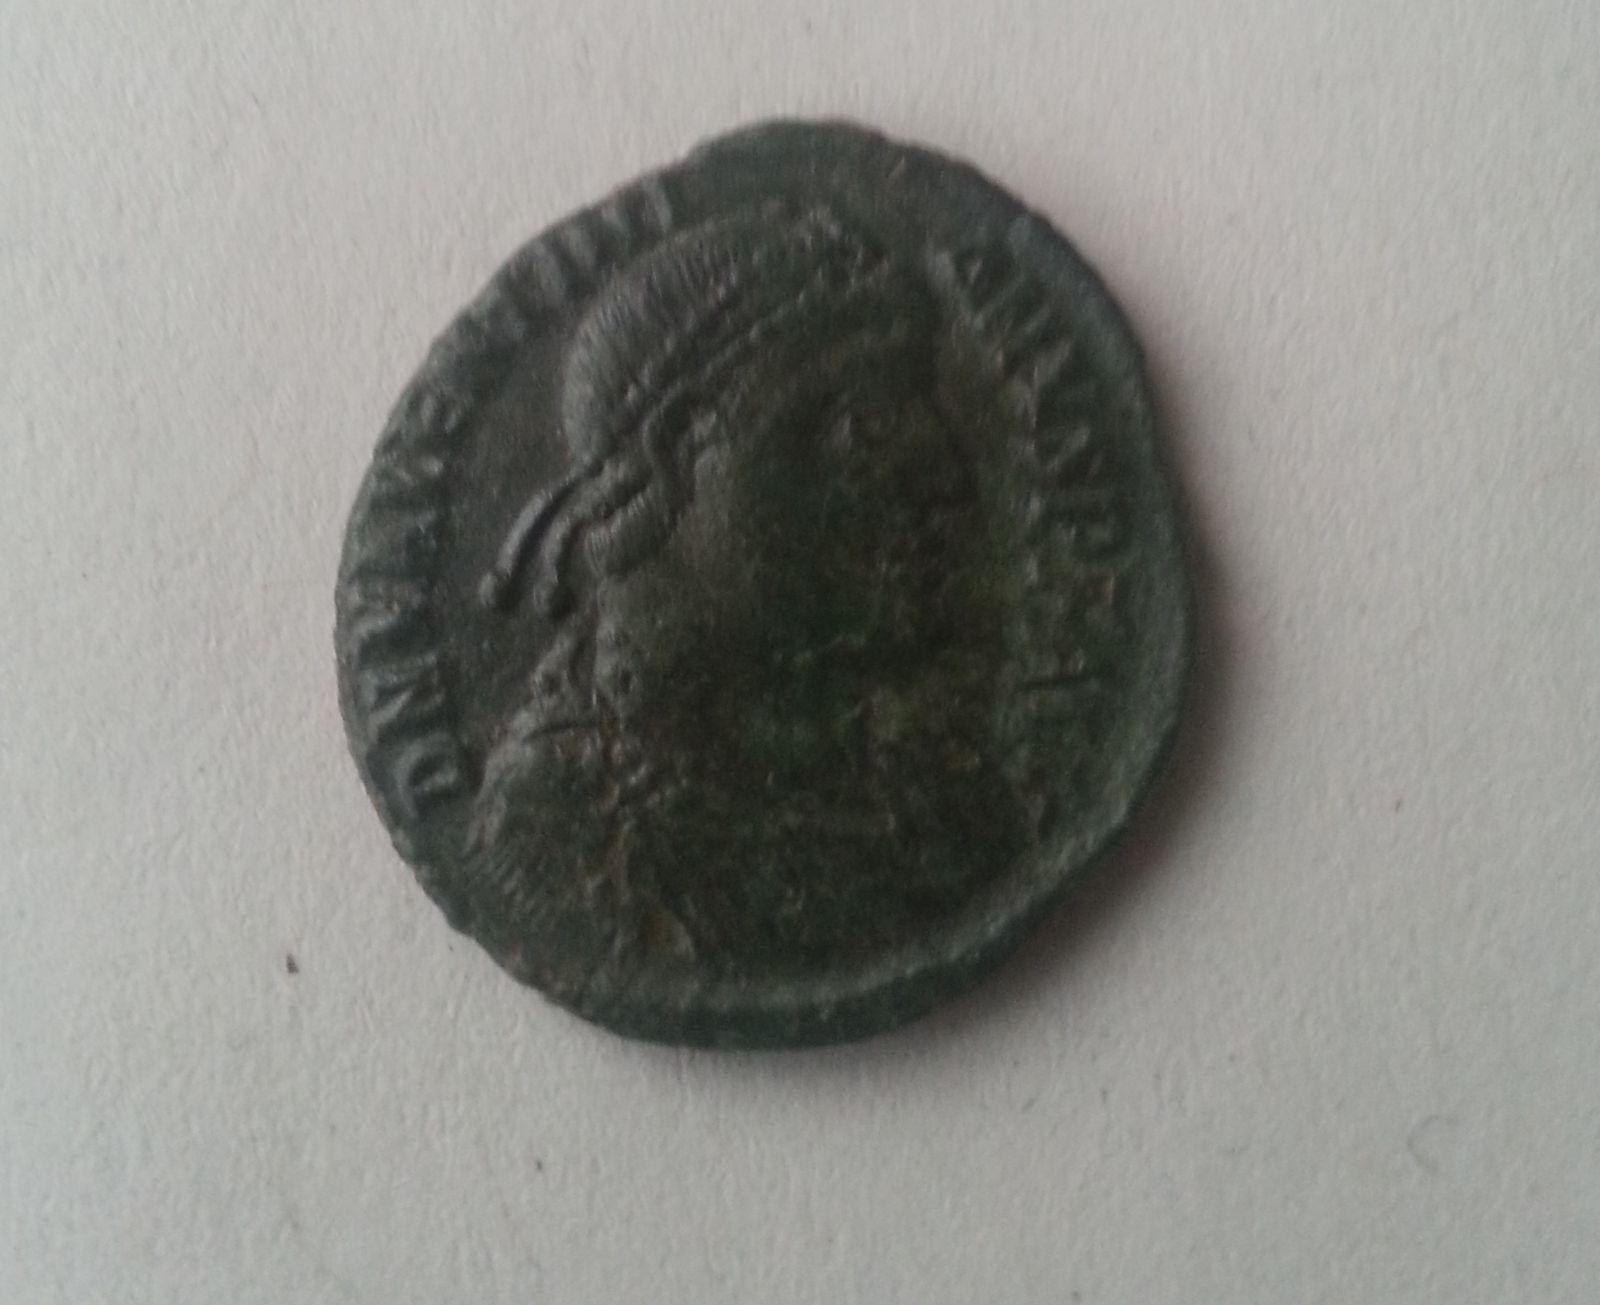 Centenionalis, Viktorie na globu, Valentinianus I., Mincovna Cysicus, 364-75, S:19481, Řím-císařství